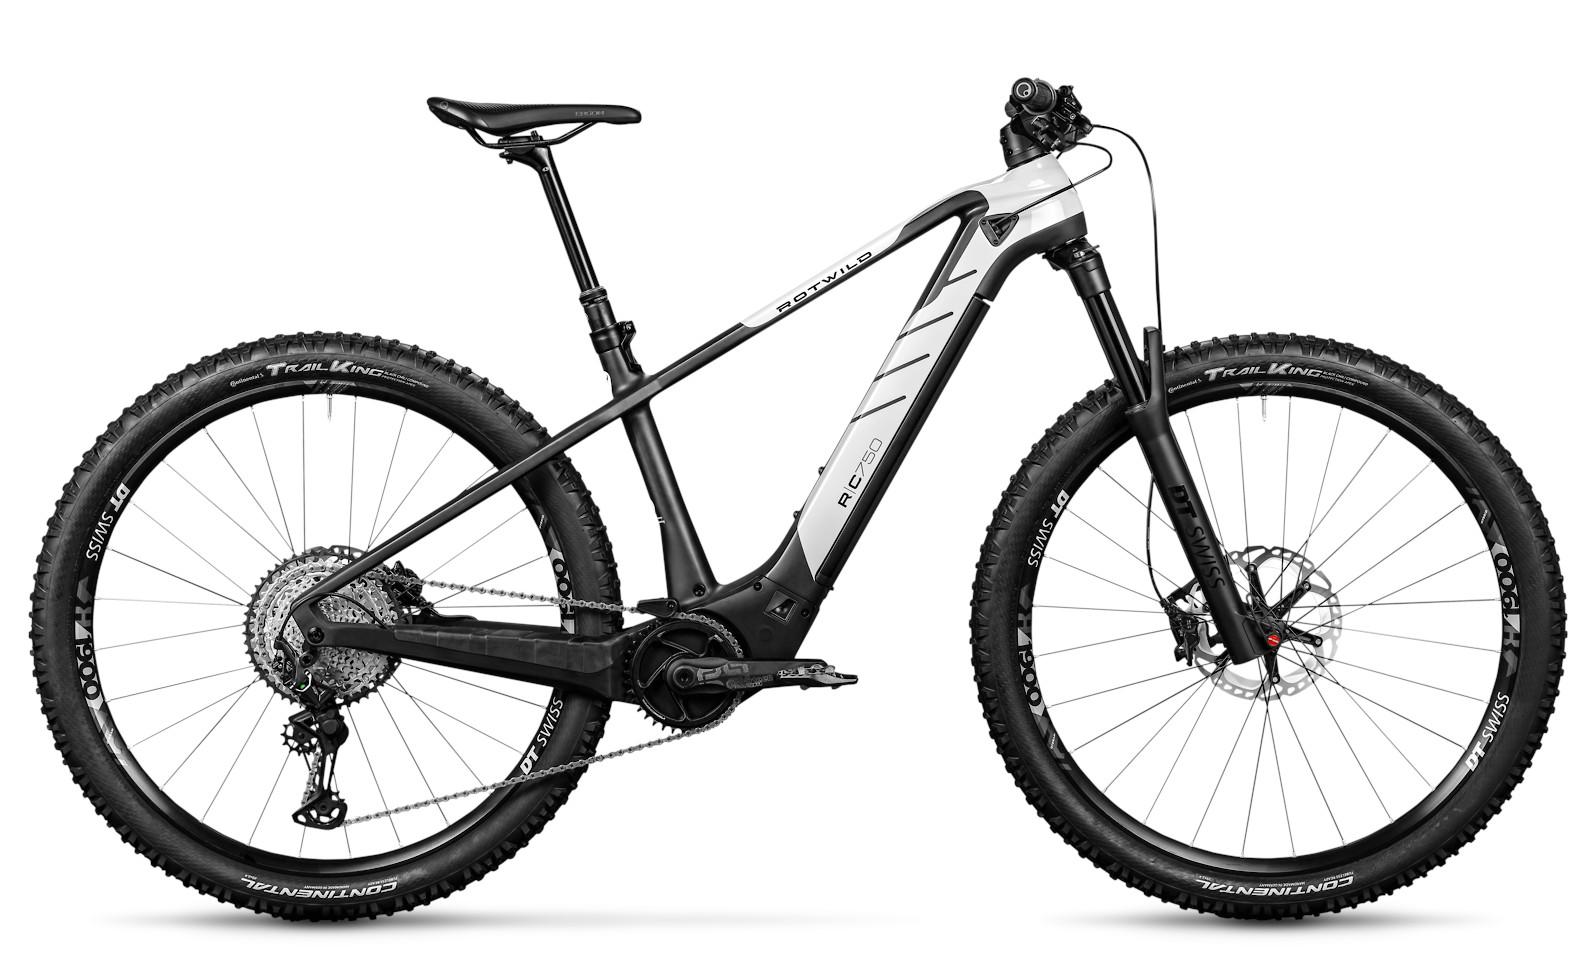 2020 Rotwild R.C750 HT Pro